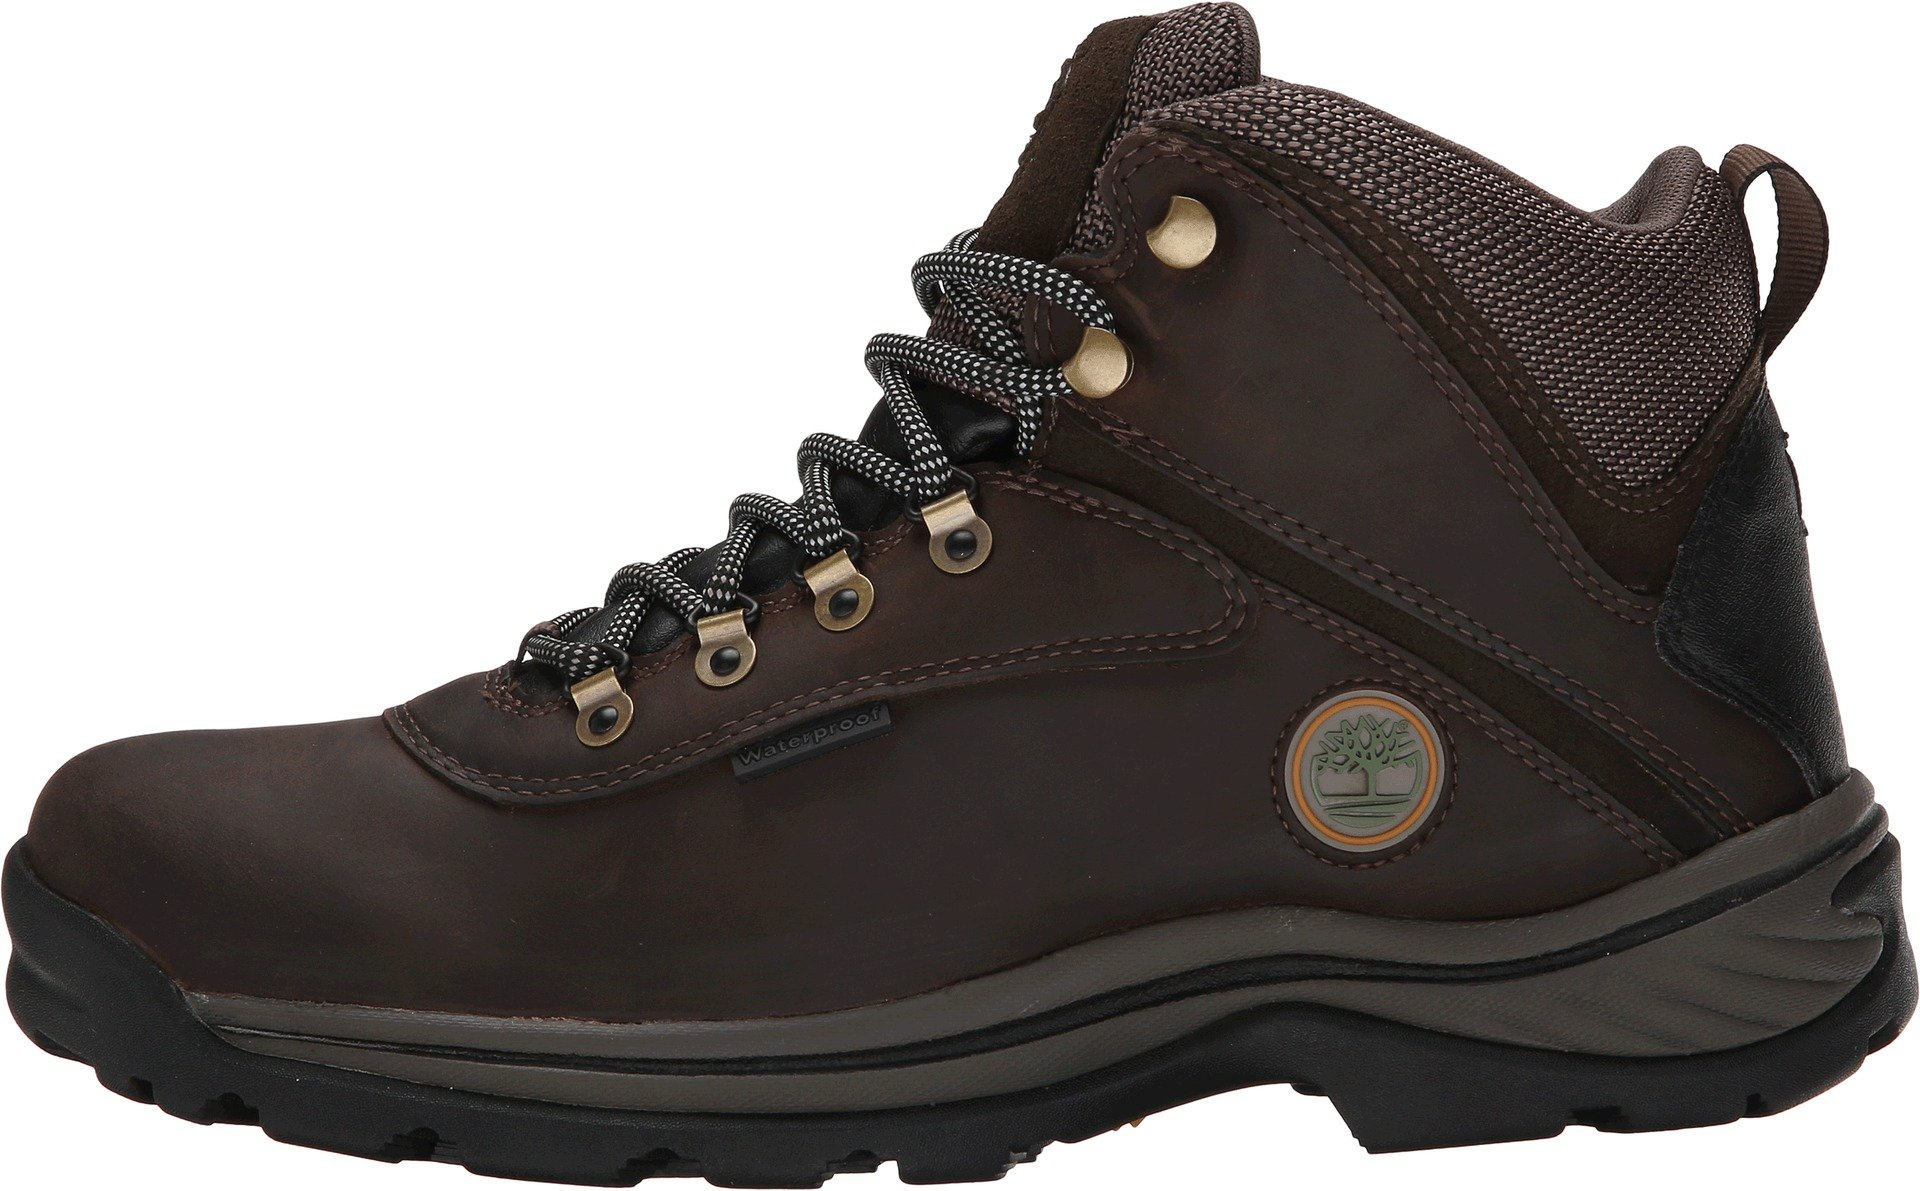 Timberland Men's White Ledge Mid Waterproof Boot,Dark Brown,9.5 W US by Timberland (Image #1)